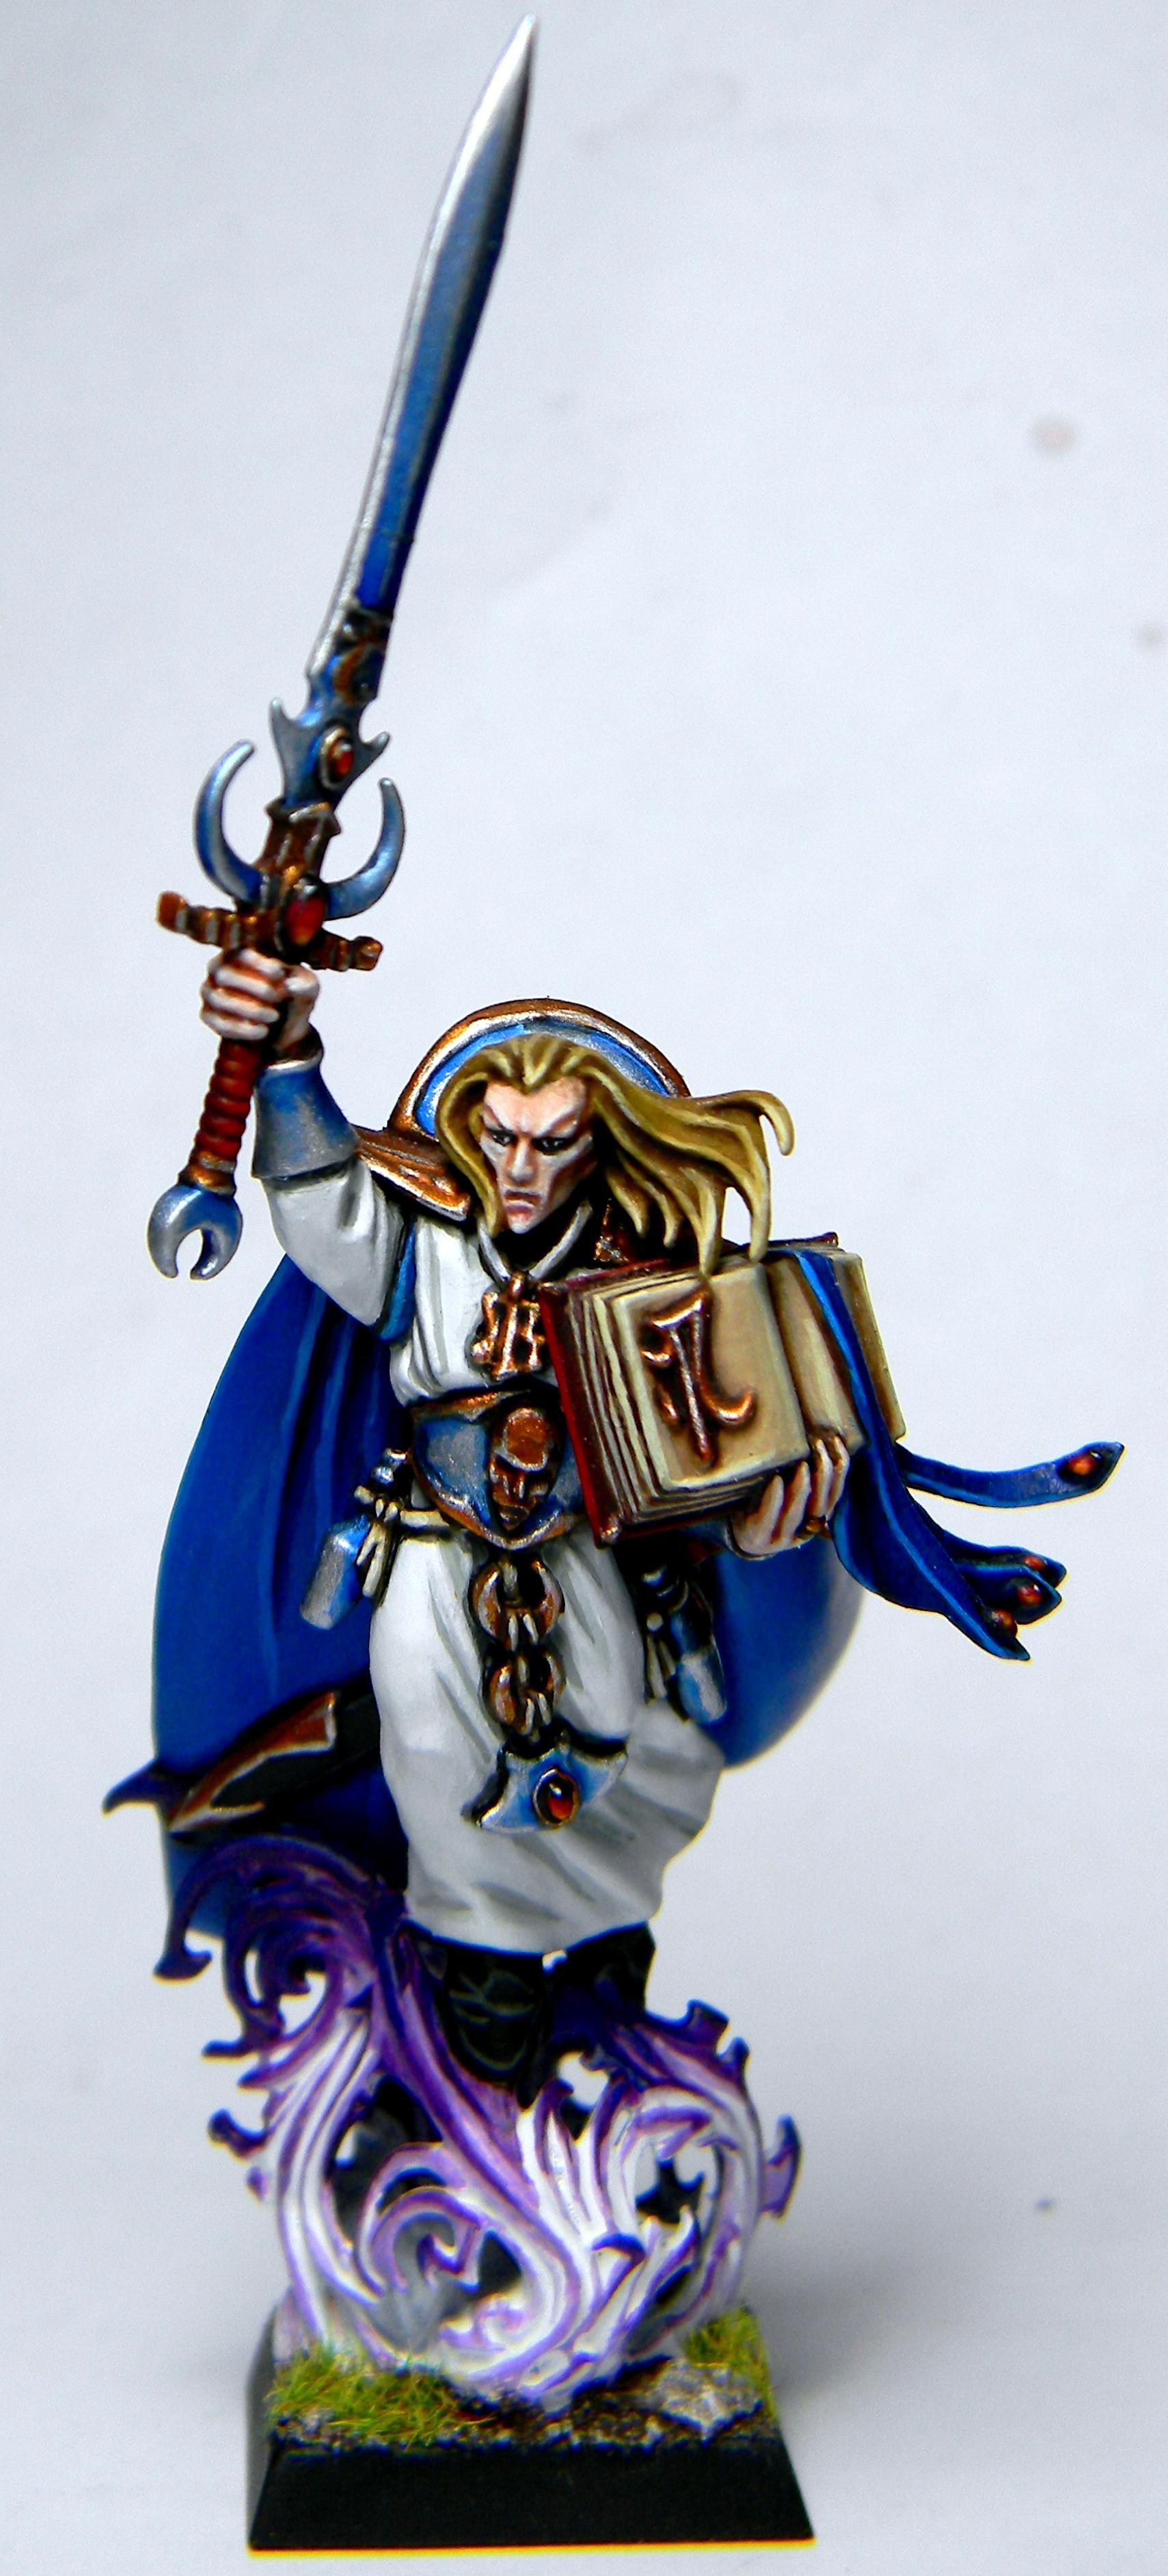 Conversion, High Elves, Island Of Blood, Loremaster, Mage, Warhammer Fantasy, Wizard